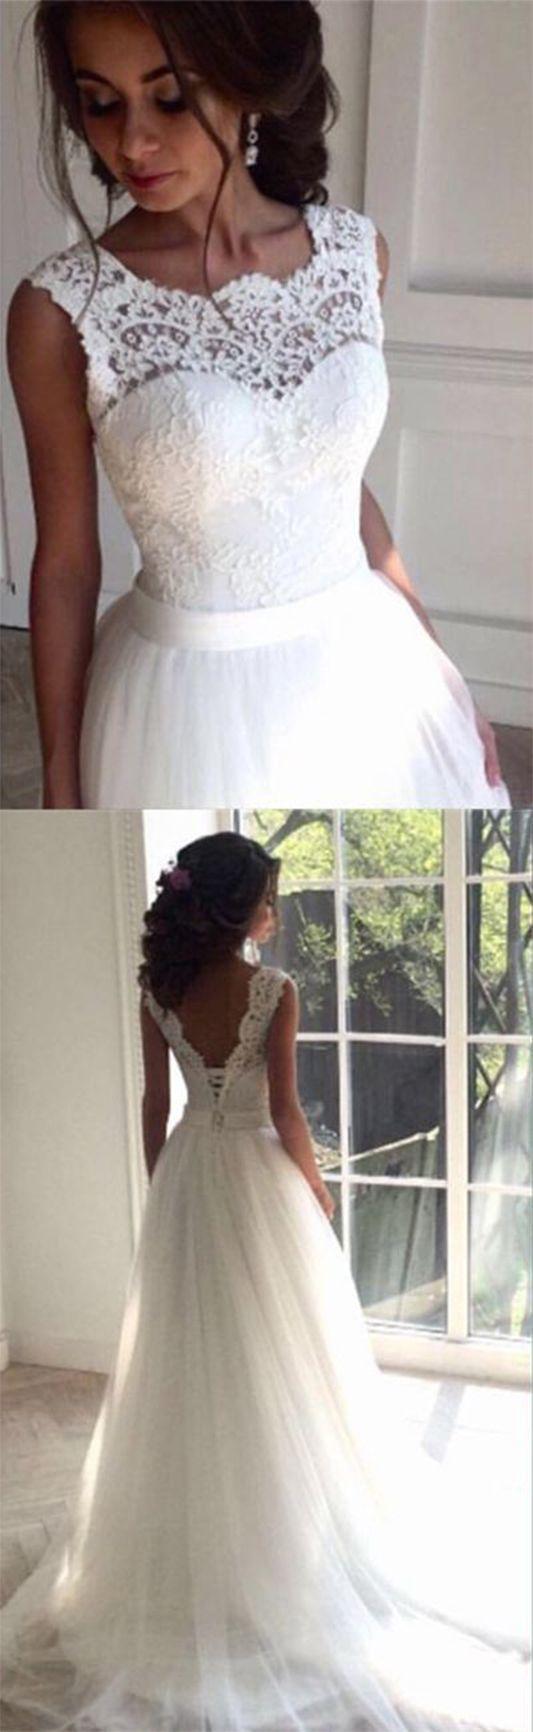 white lace wedding dress cheapest wedding dresses Simple Wedding Dress Charming wedding dress lace wedding dress Tulle White wedding dress cheap wedding gown bridal wedding dress sold by SIMIBRIDALDRESS